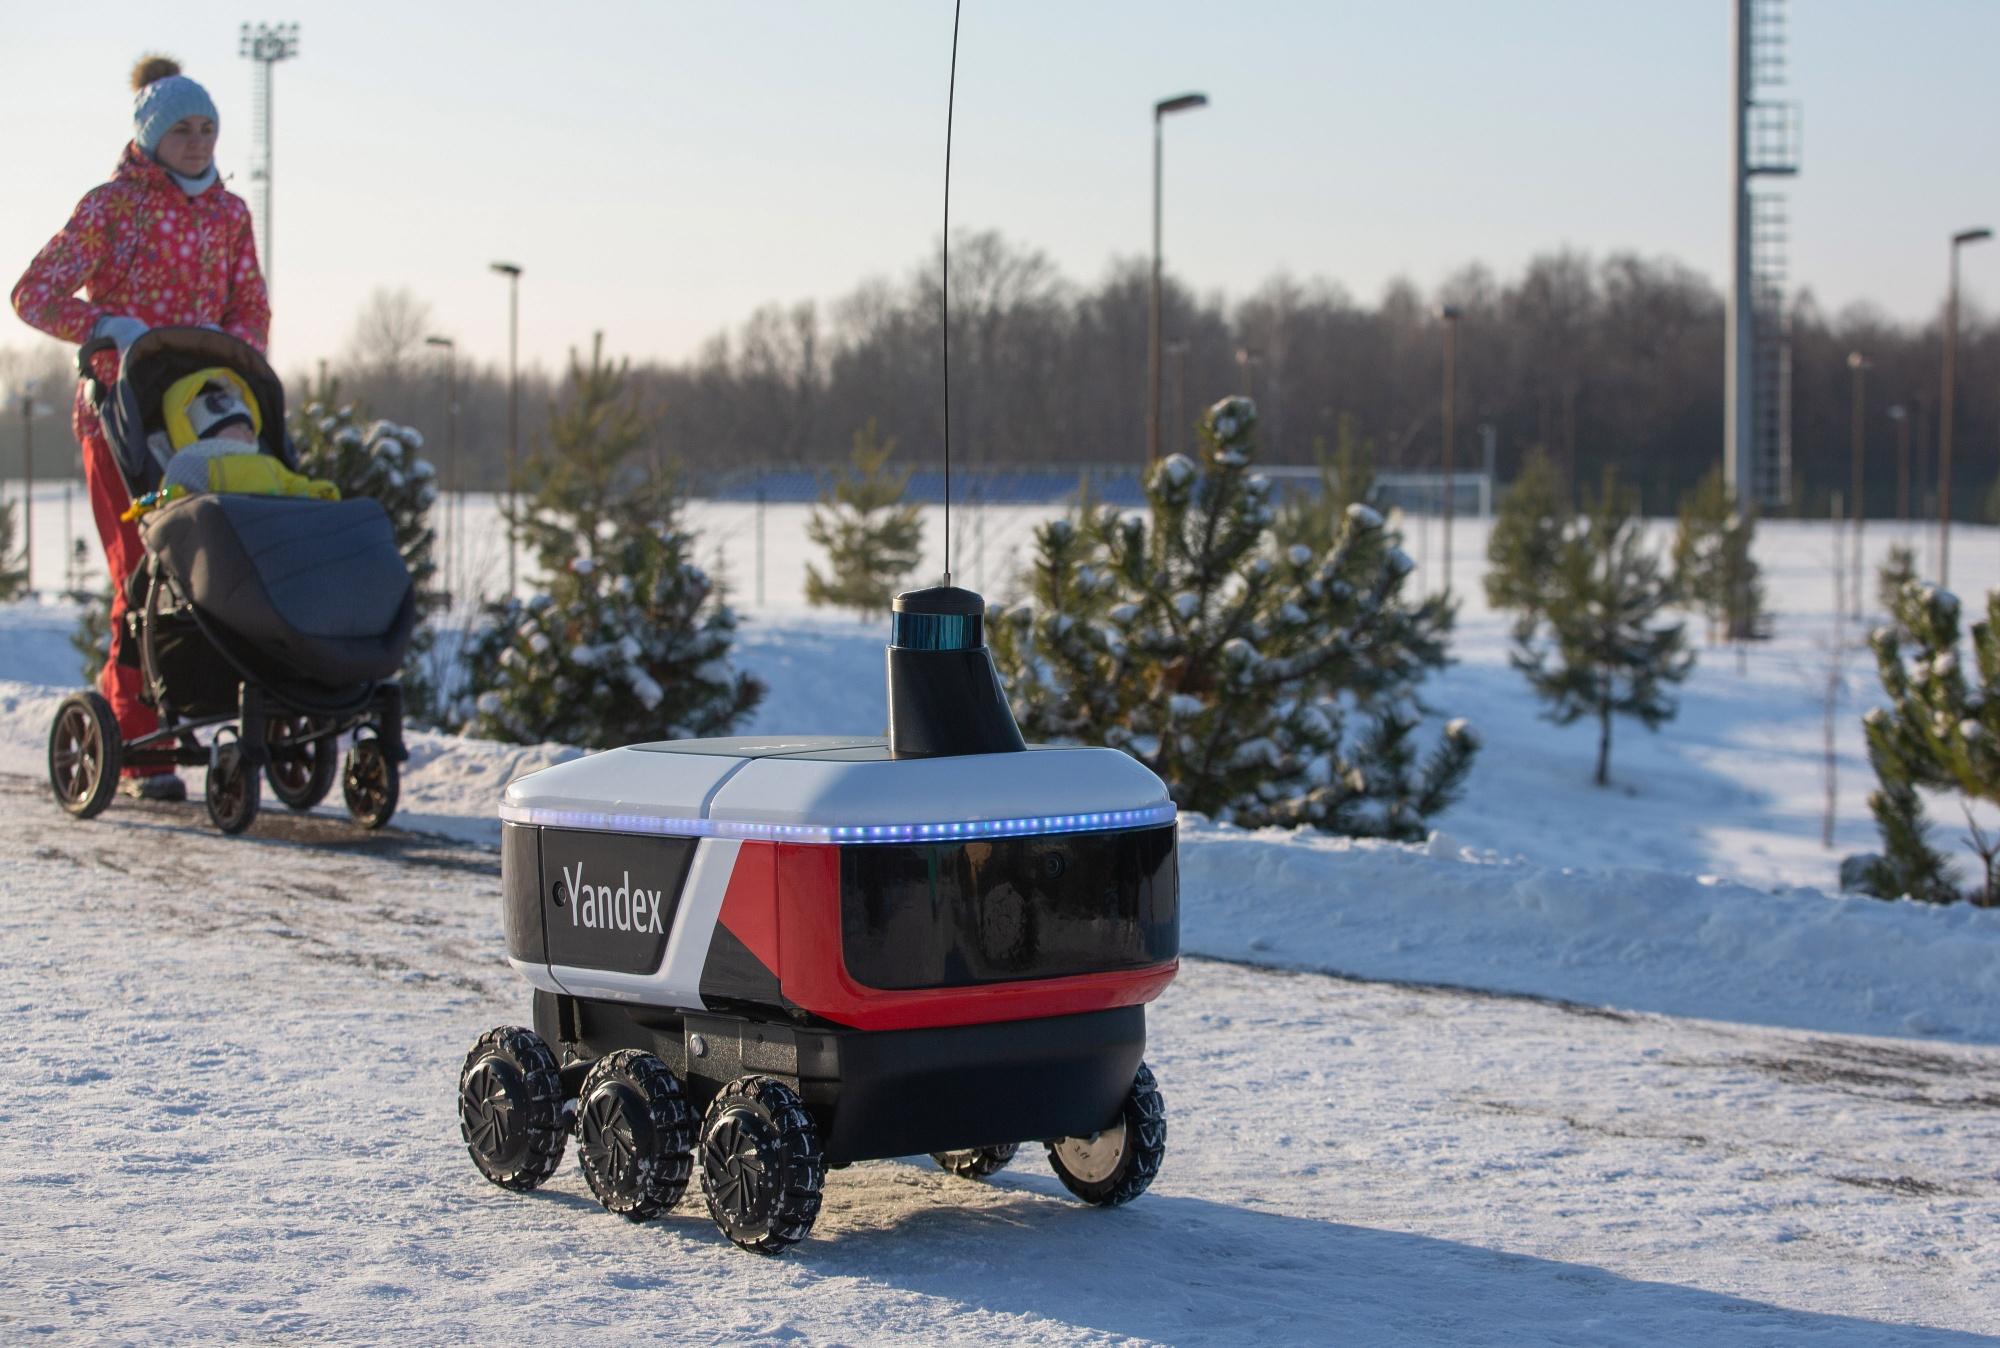 Yandex NV Tests Autonomous Delivery Robots on Russian Streets